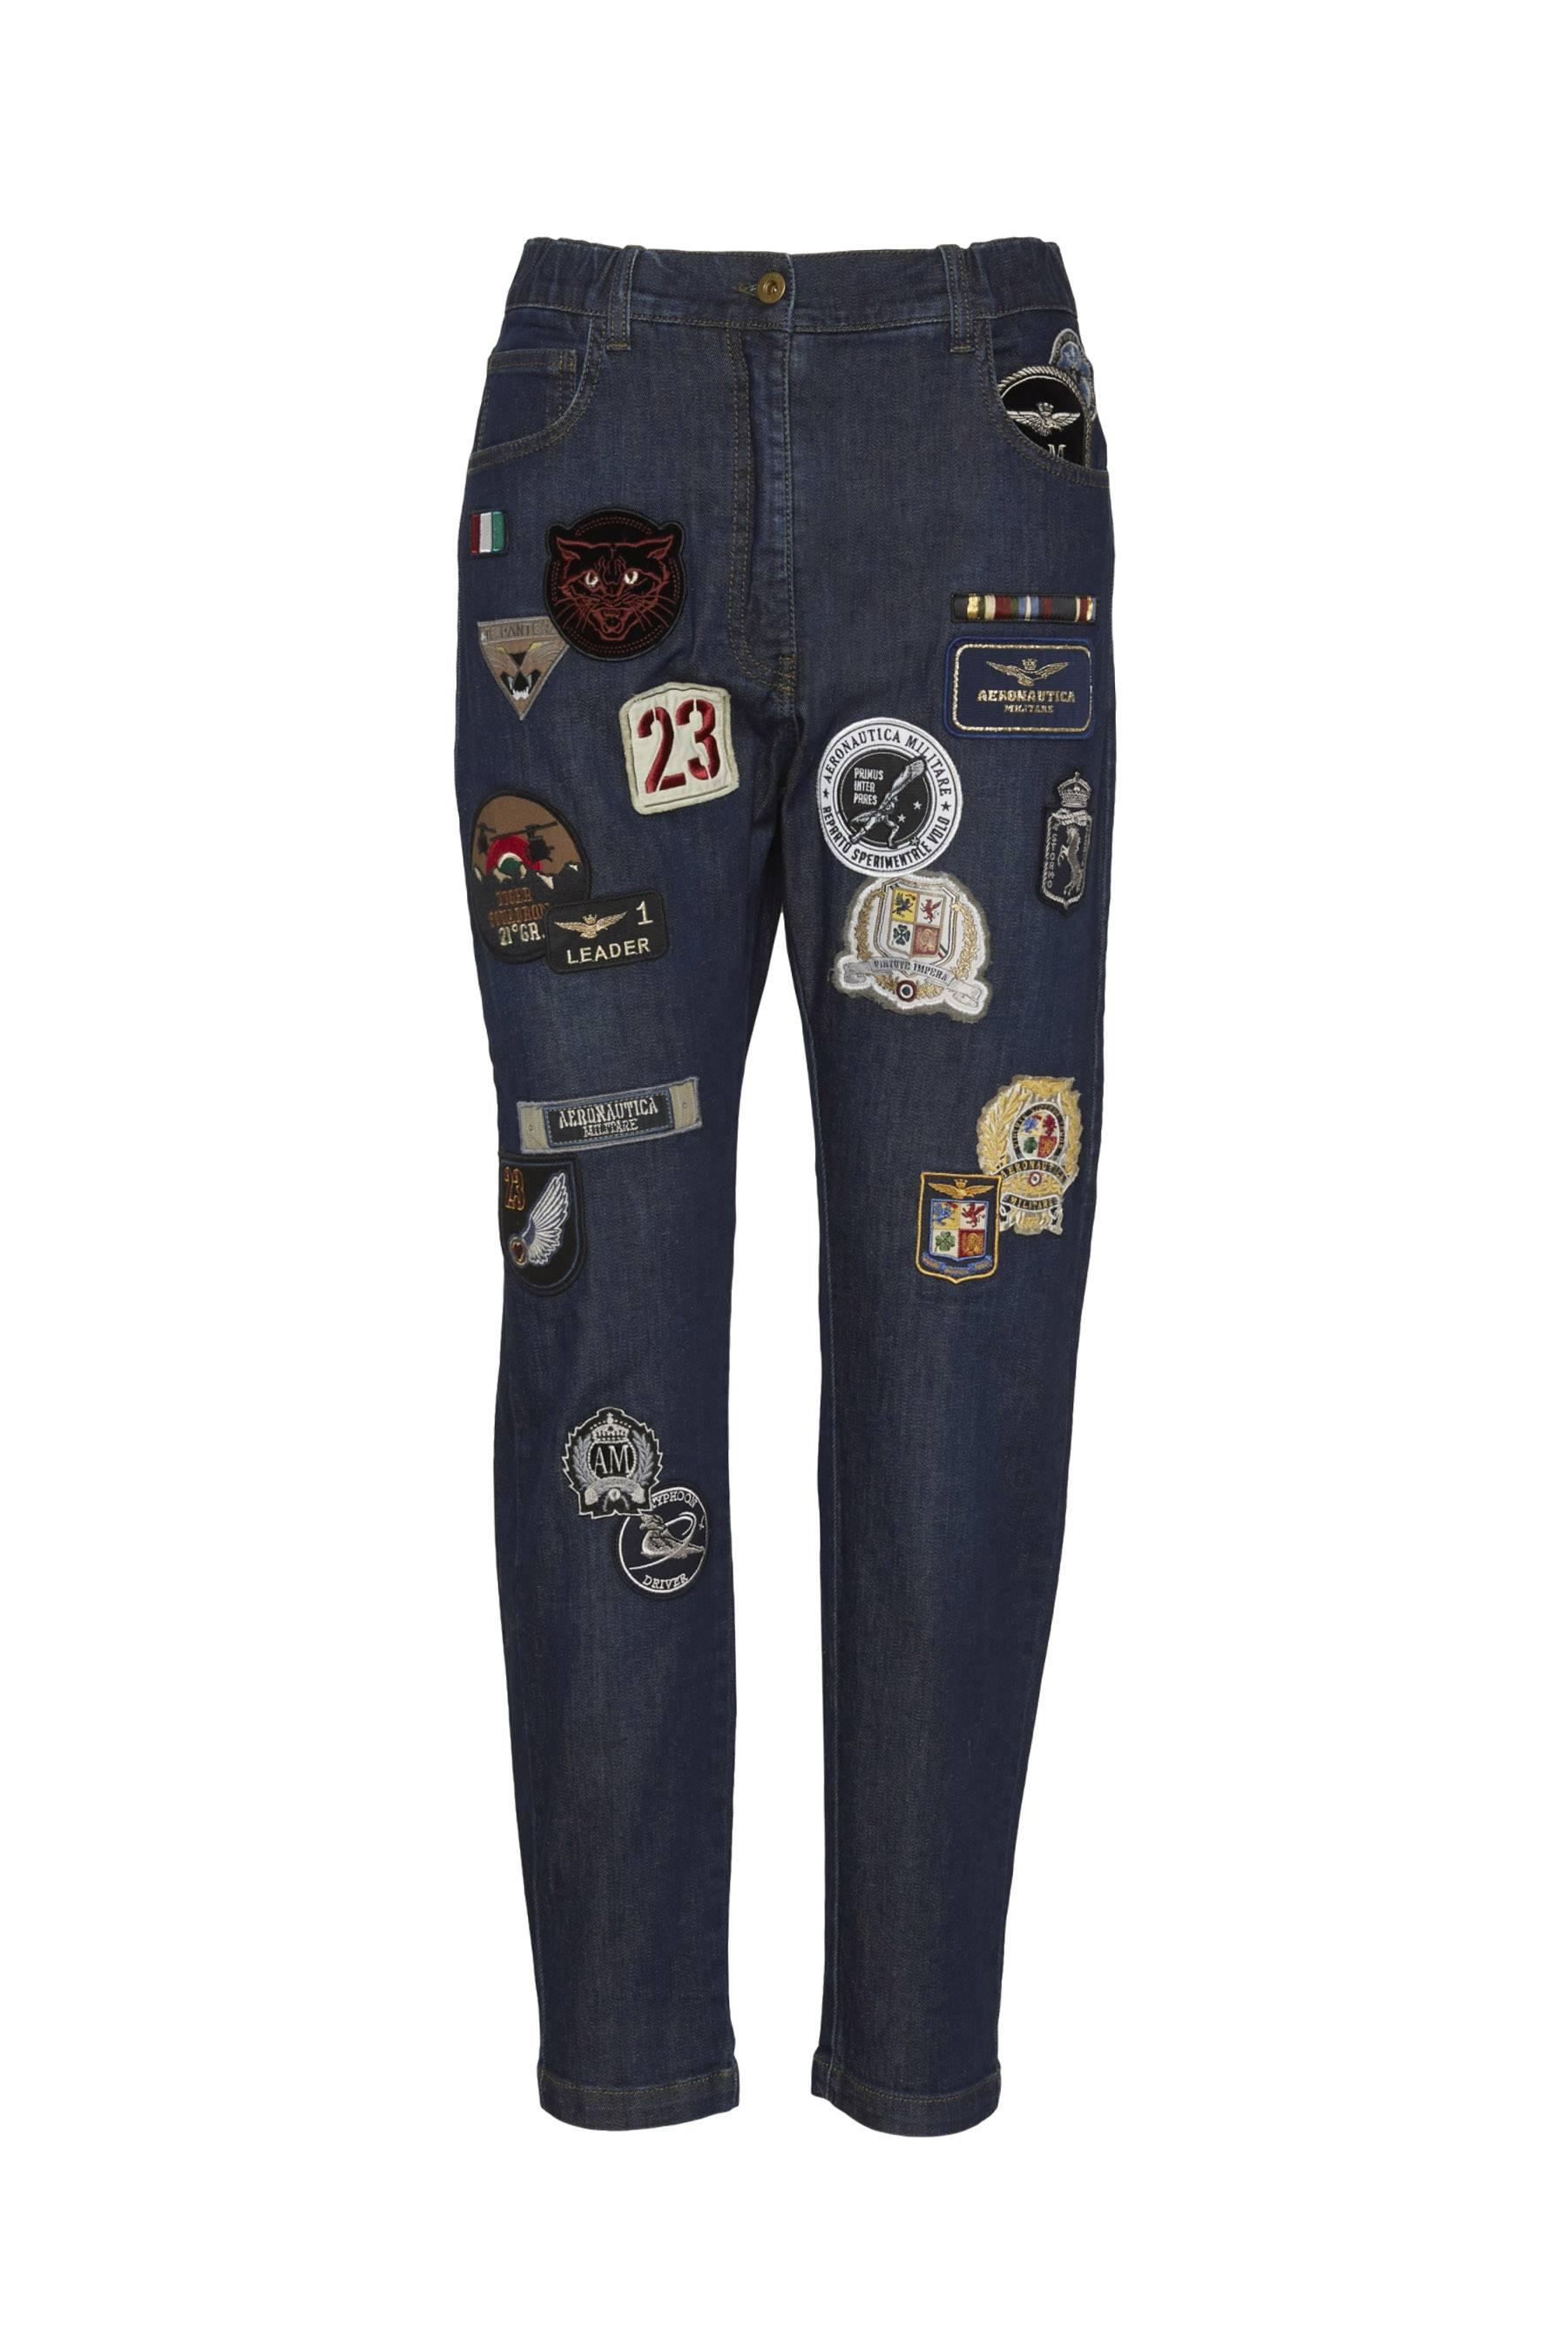 Denim patched jeans  1